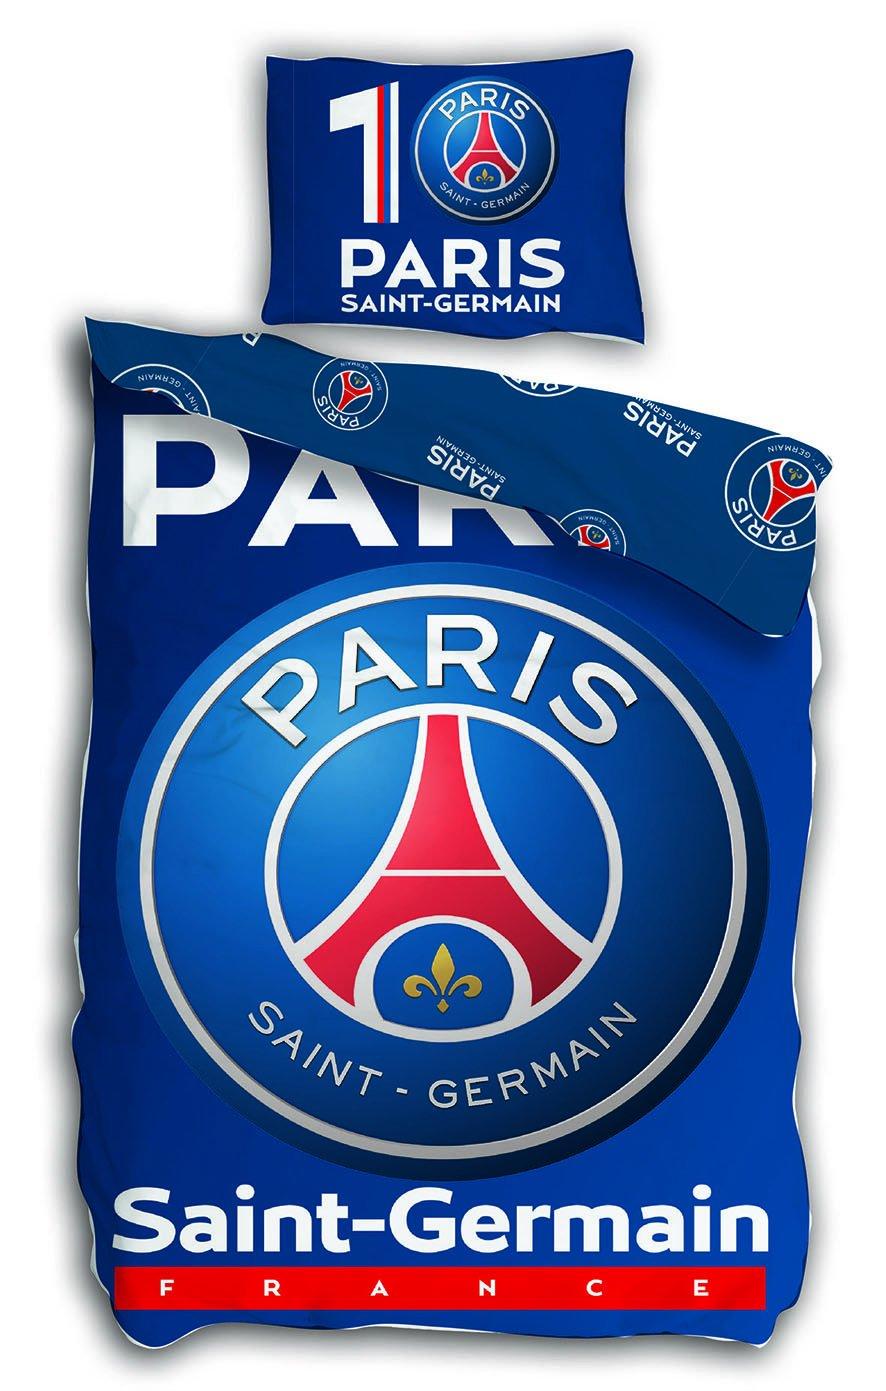 /Juego de Cama/ /Funda de Edred/ón 140/x 200/cm Funda de Almohada 63/x 63/cm Paris St German F/útbol PSG/